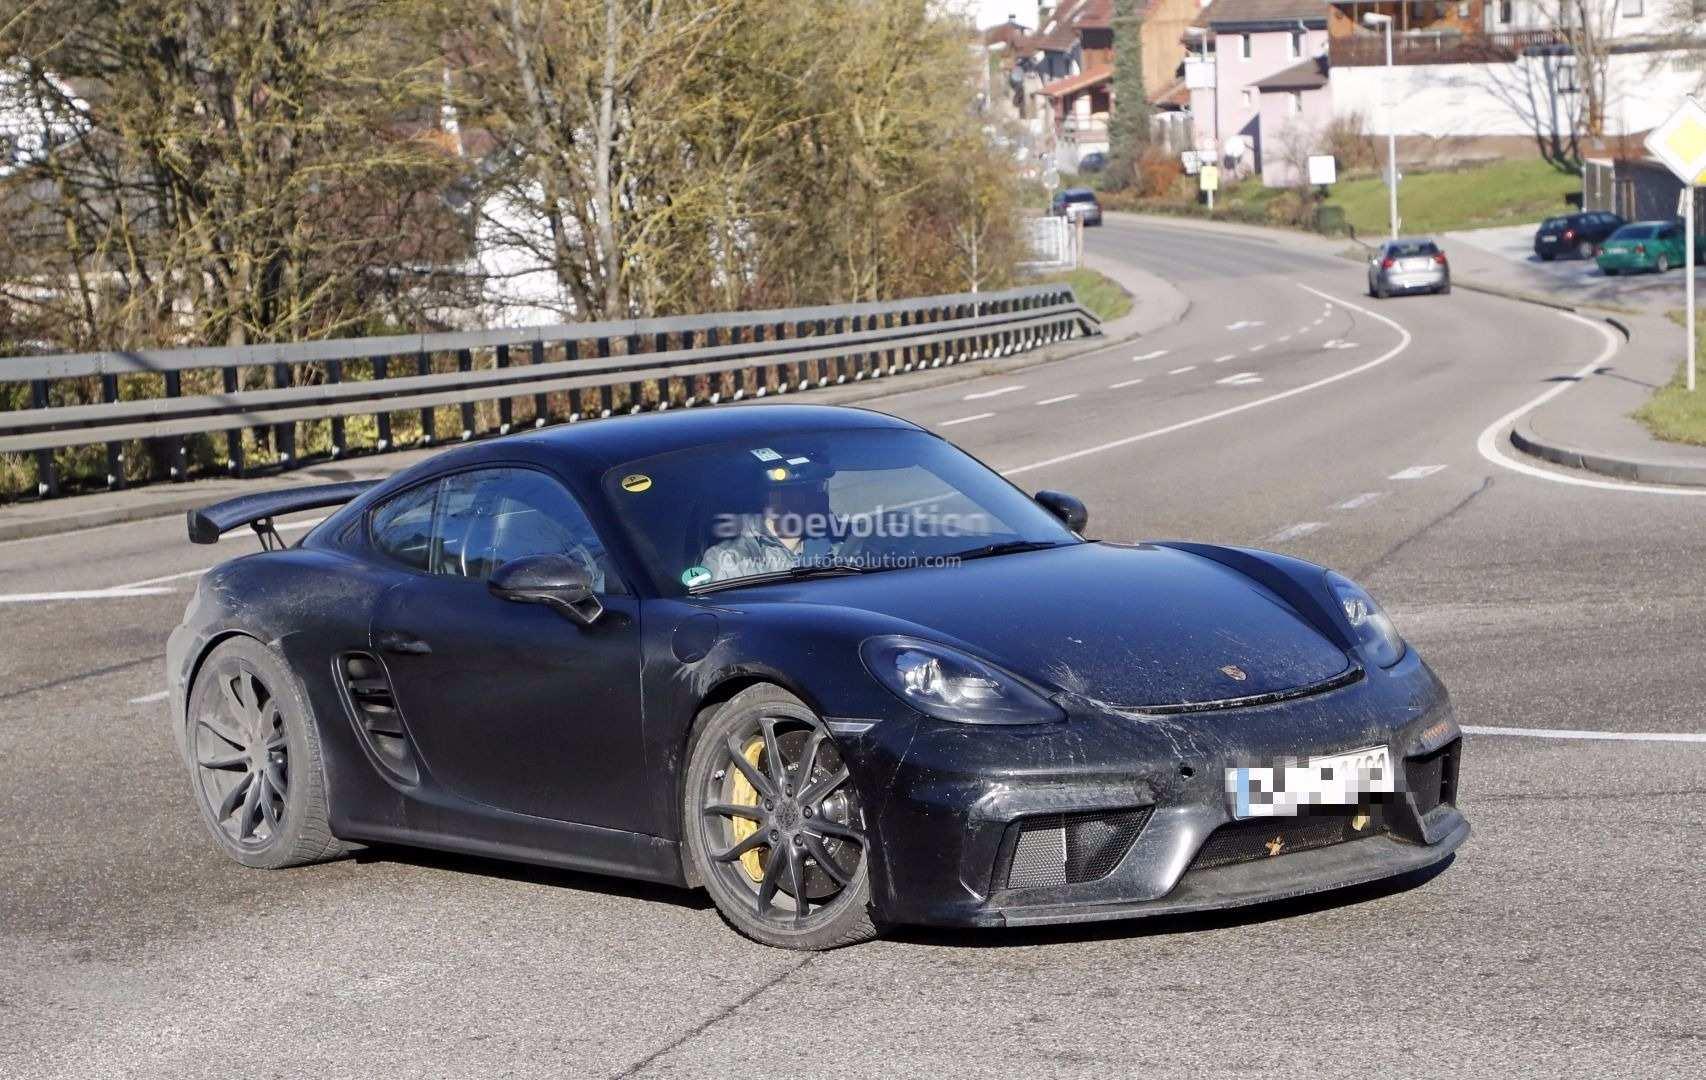 83 All New 2019 Porsche 718 Overview by 2019 Porsche 718